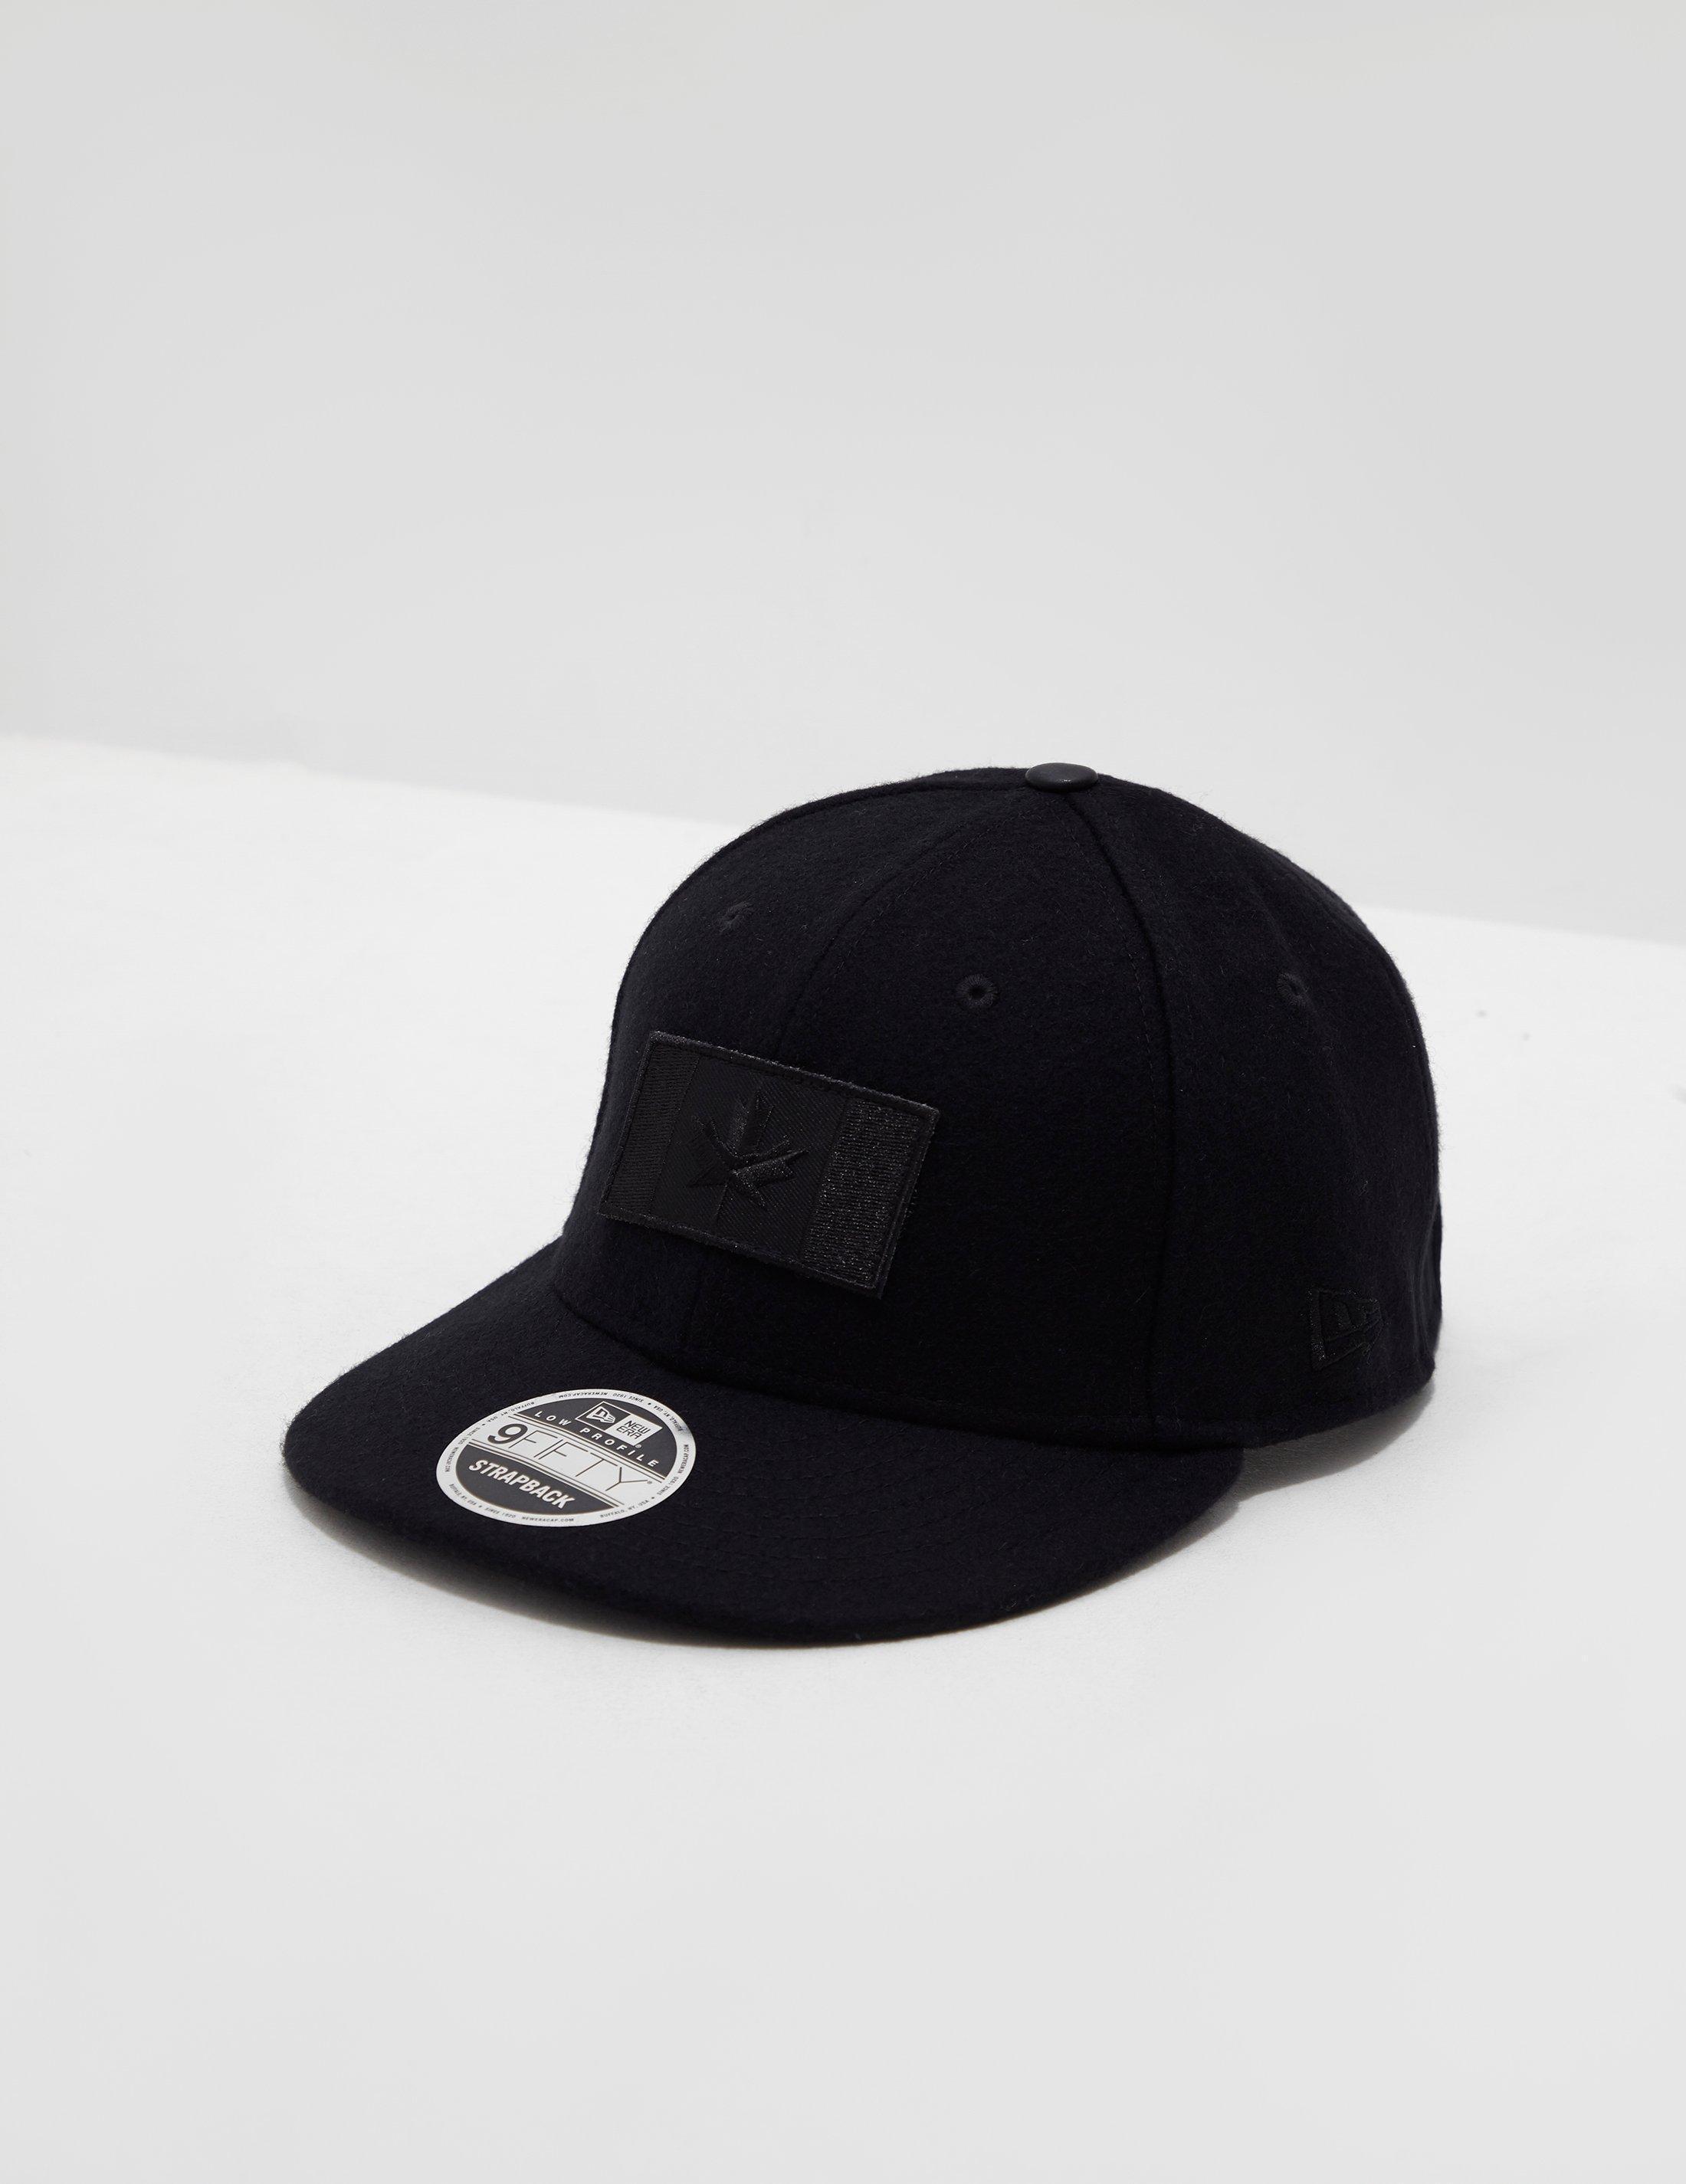 9fa6a08533f Canada Goose Wool Cap Black in Black for Men - Lyst